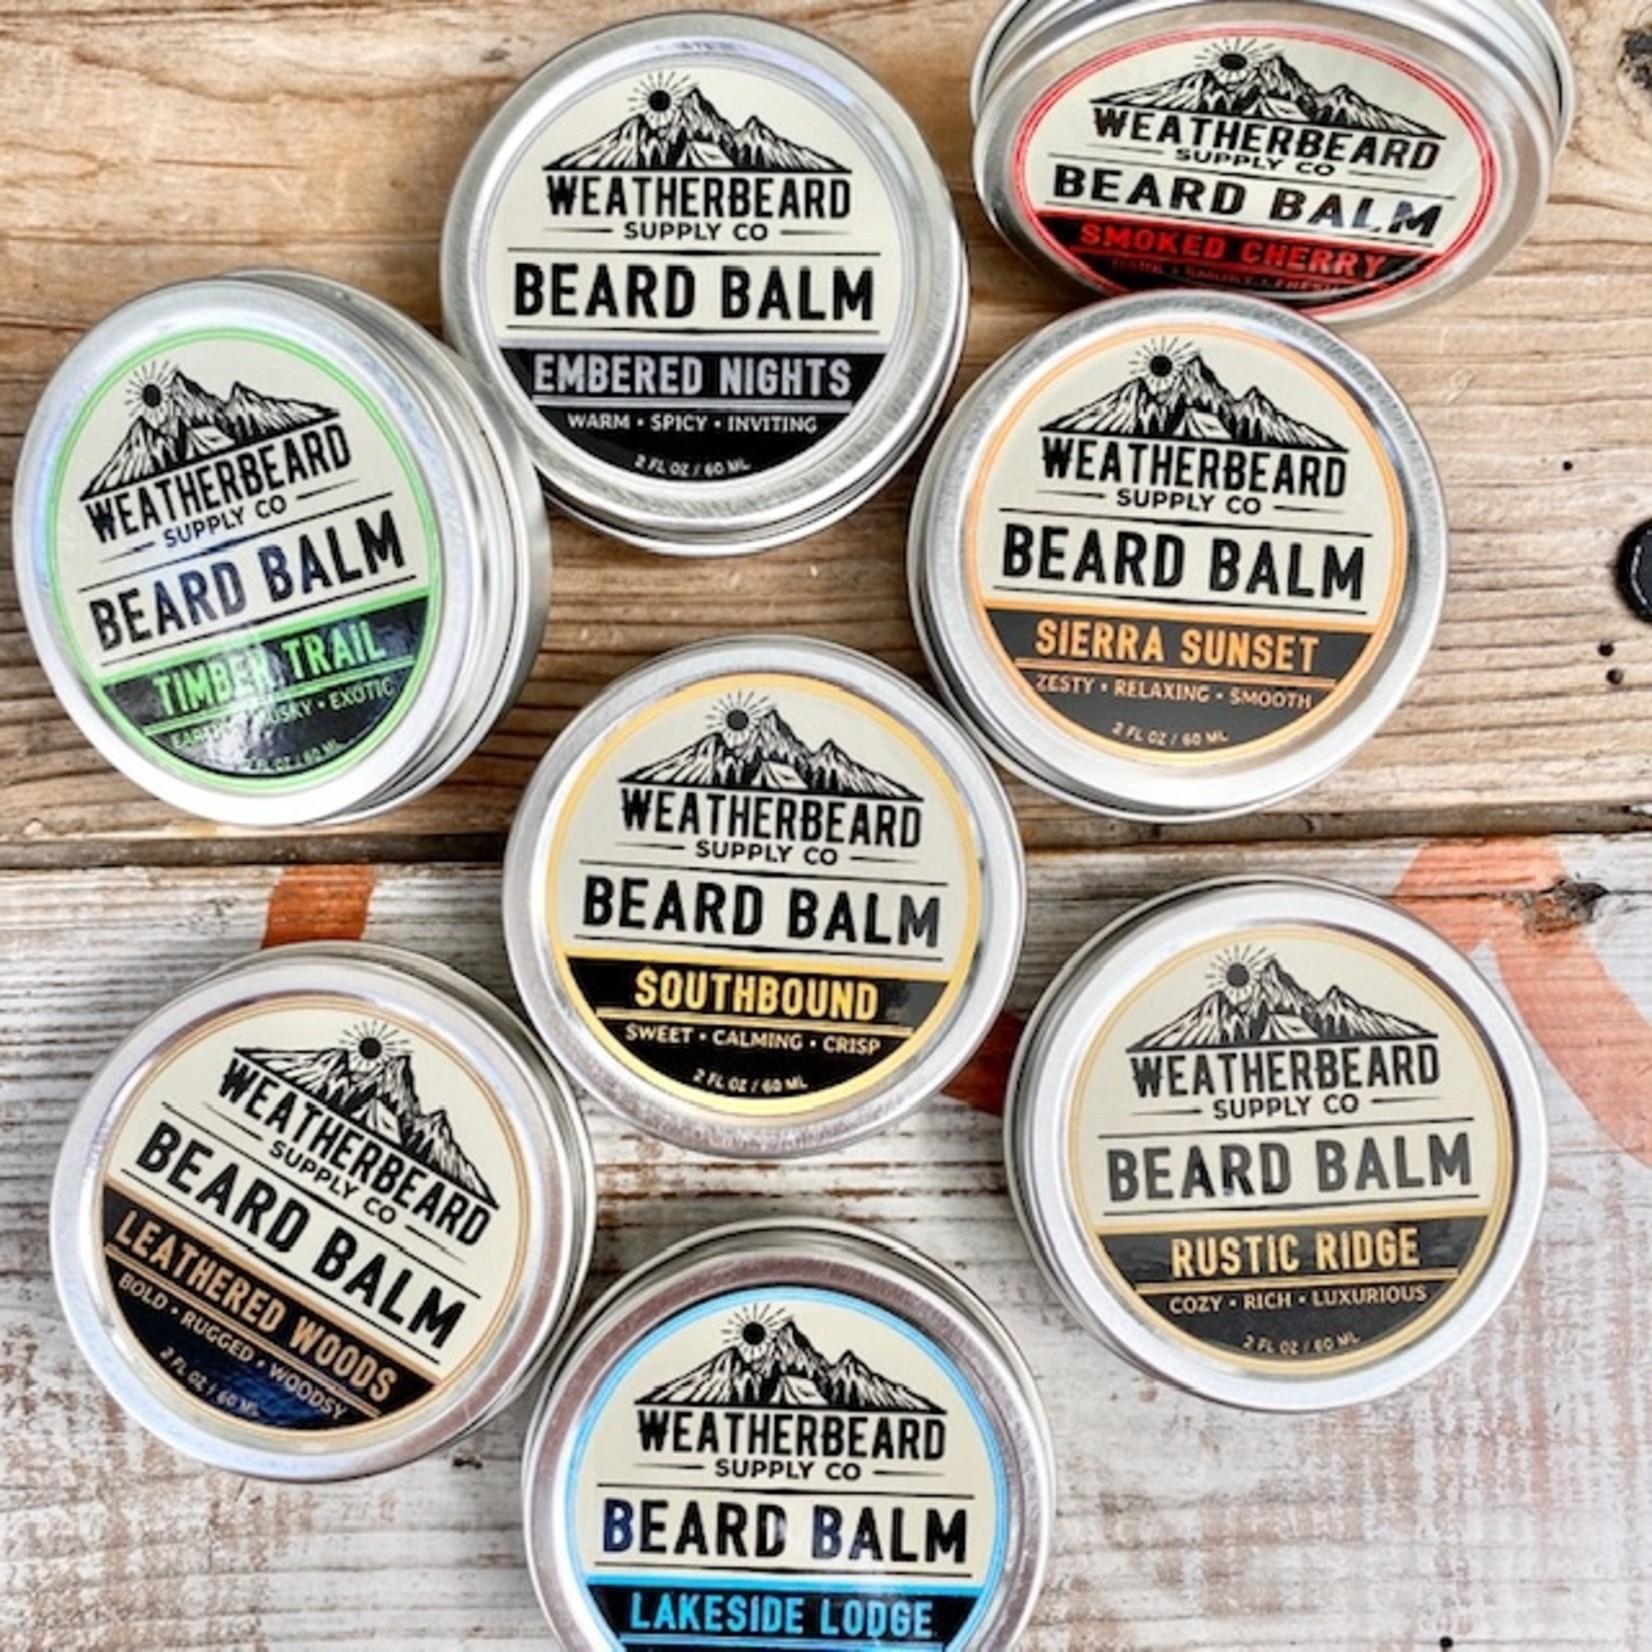 WeatherBeard Supply Co. Weatherbeard Beard Balms